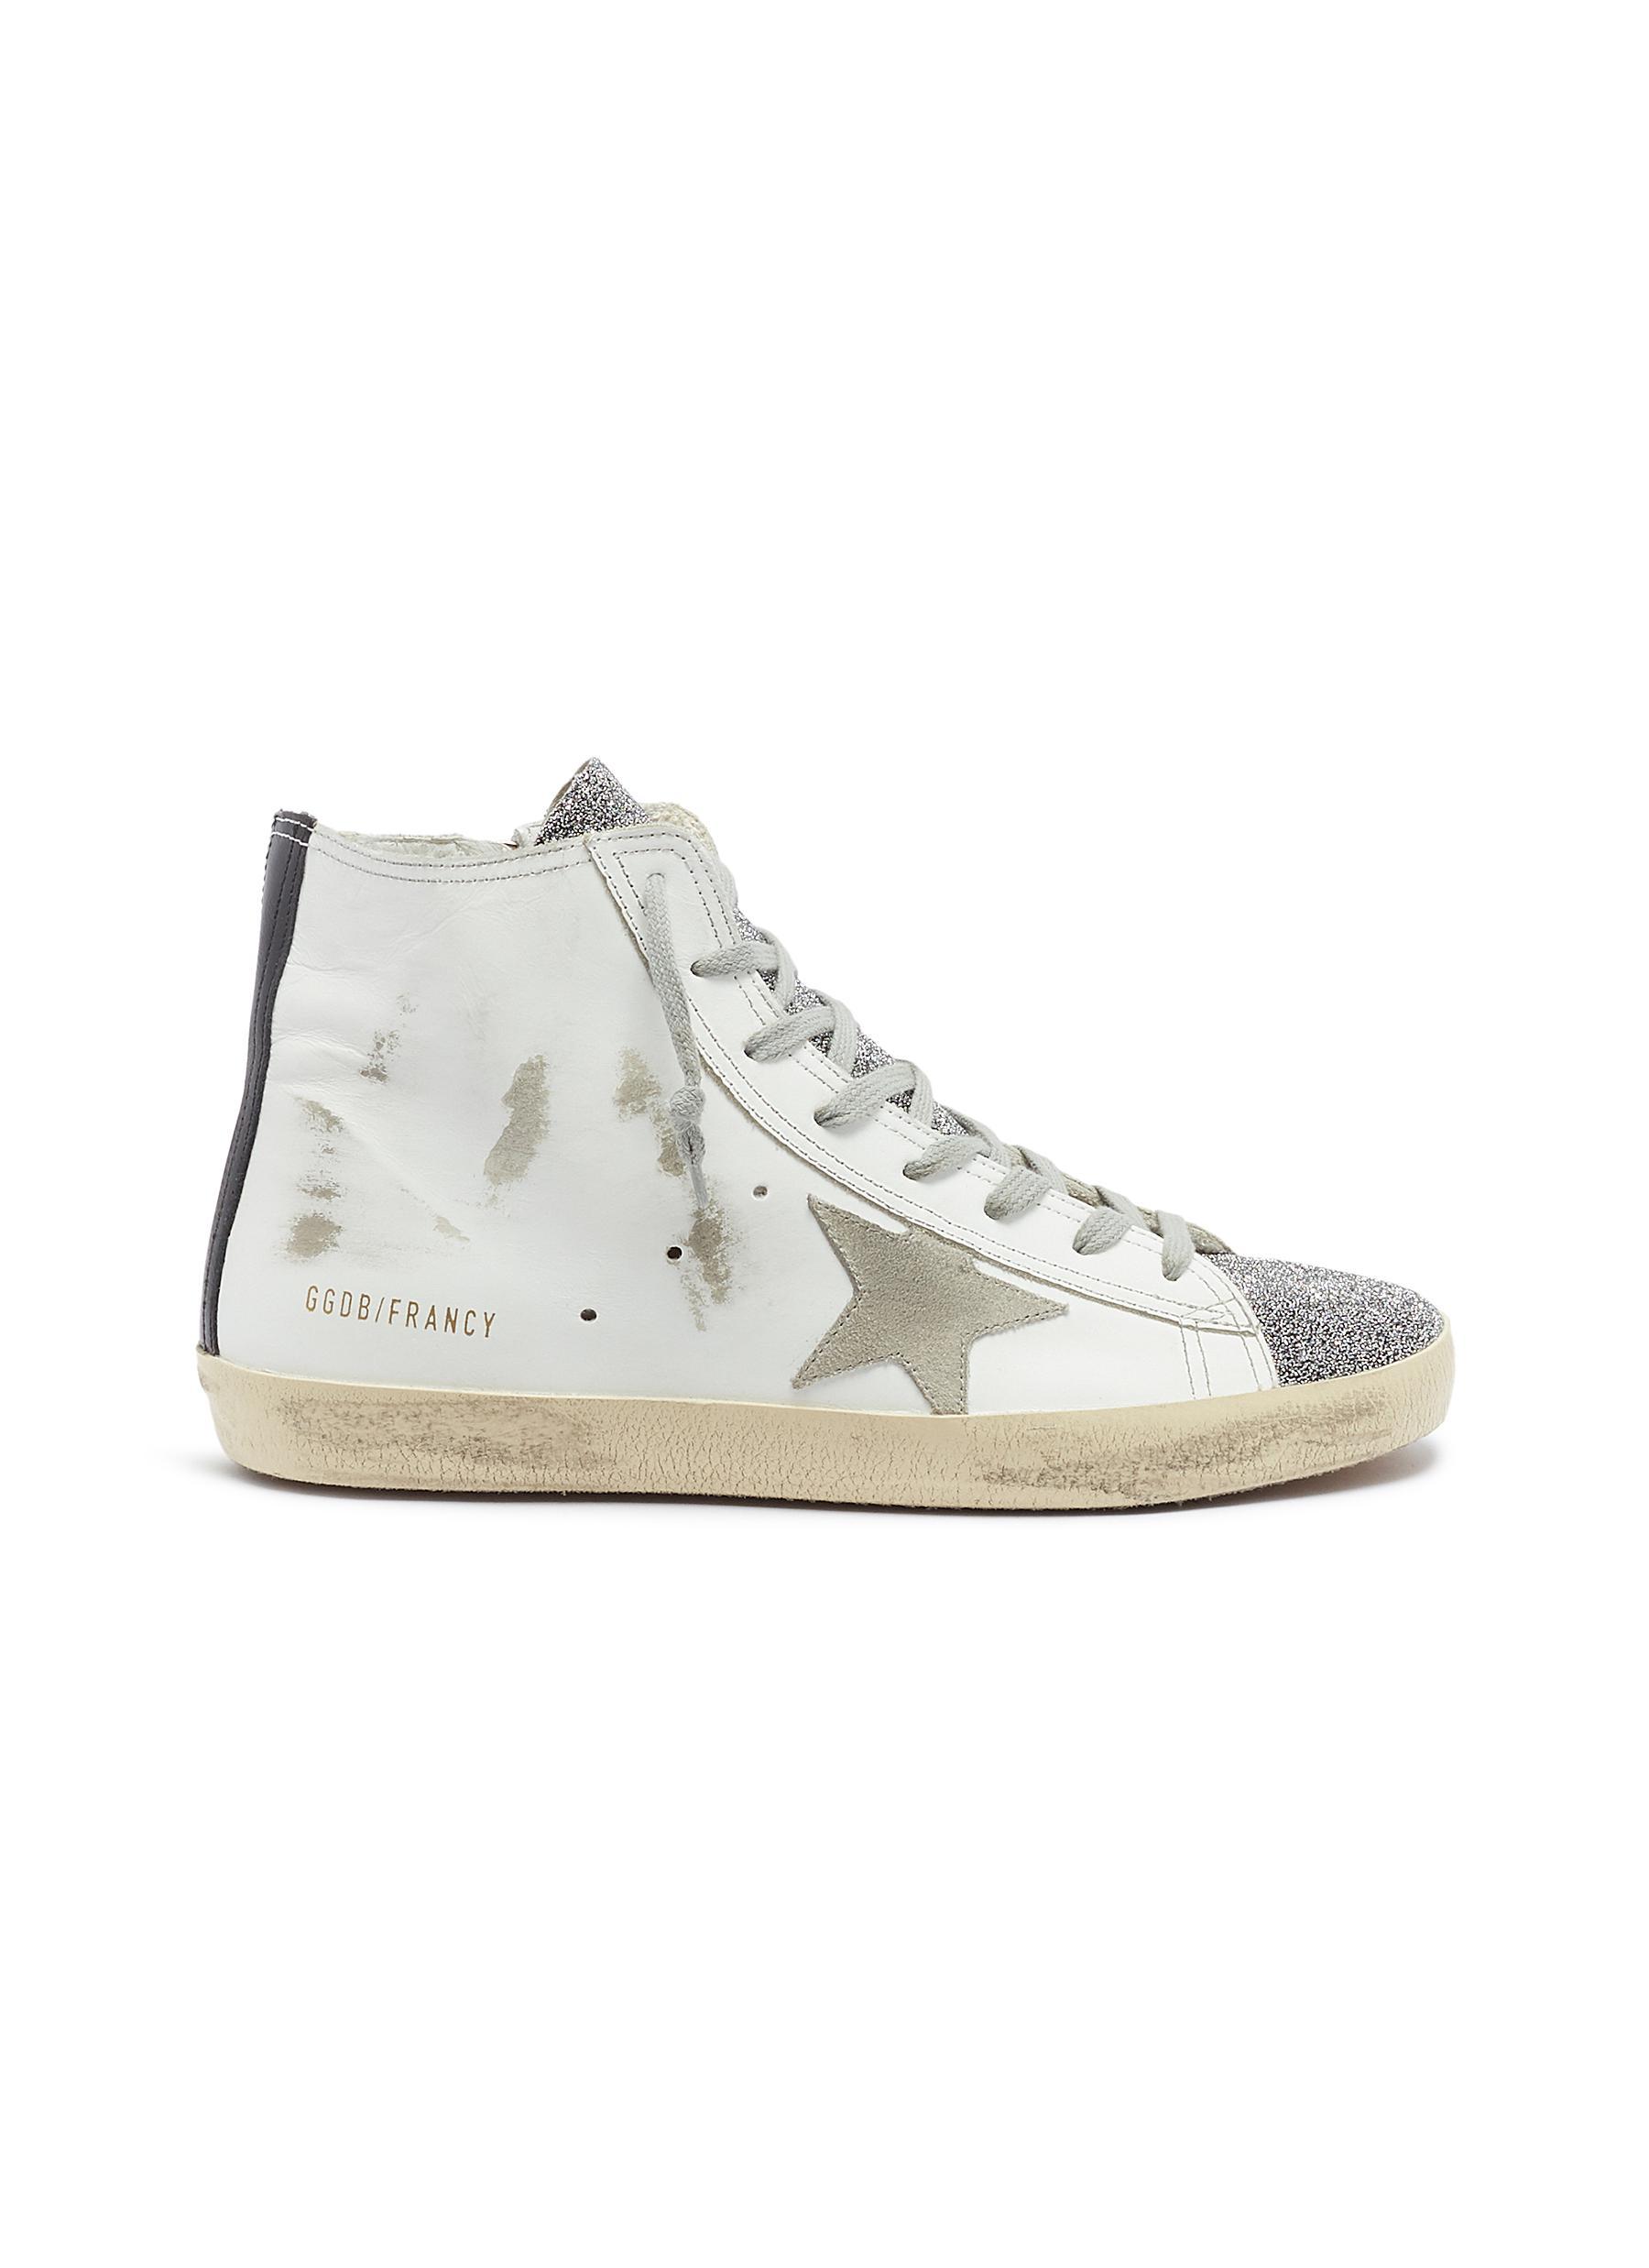 Golden Goose Sneakers Francy bead leather high top sneakers